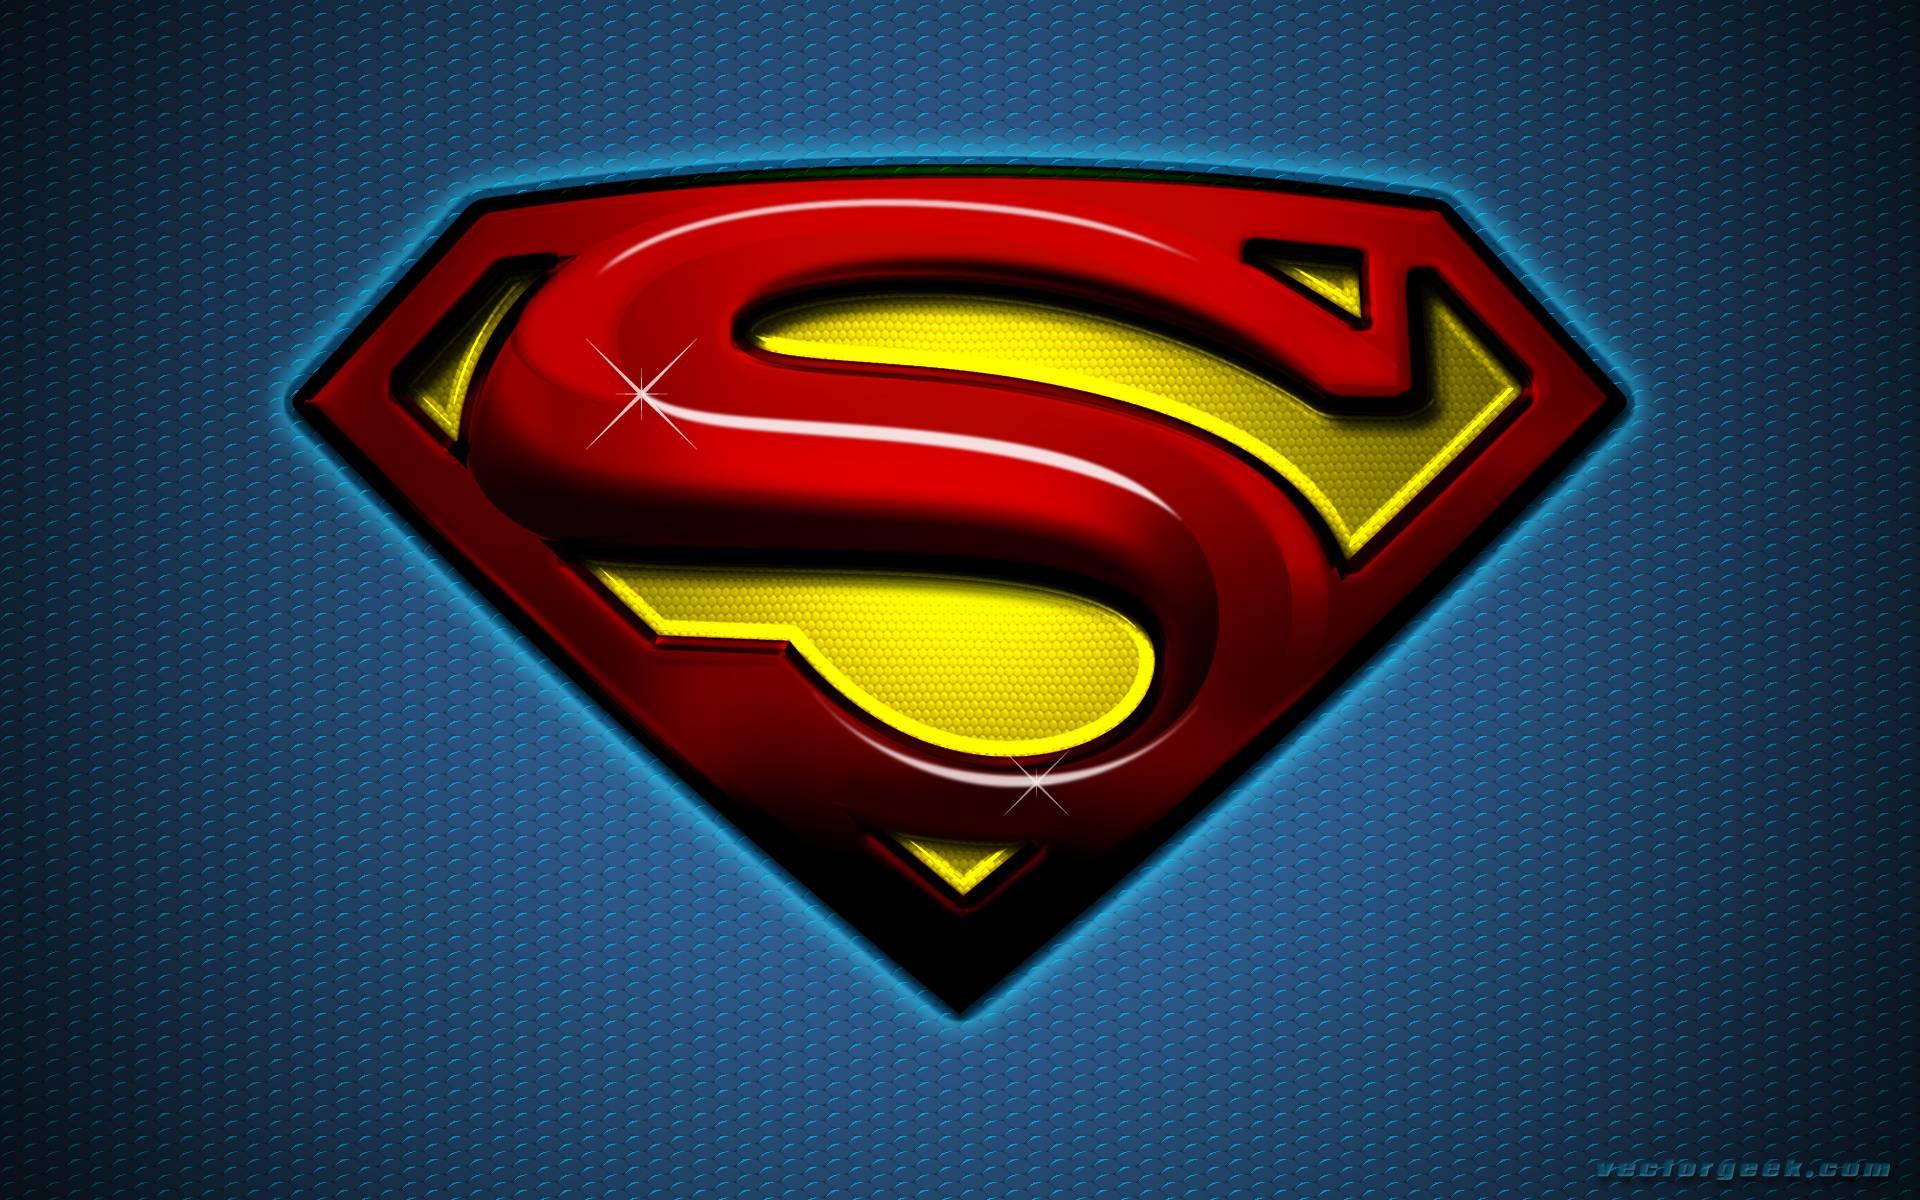 Superman logo wallpapers wallpaper cave